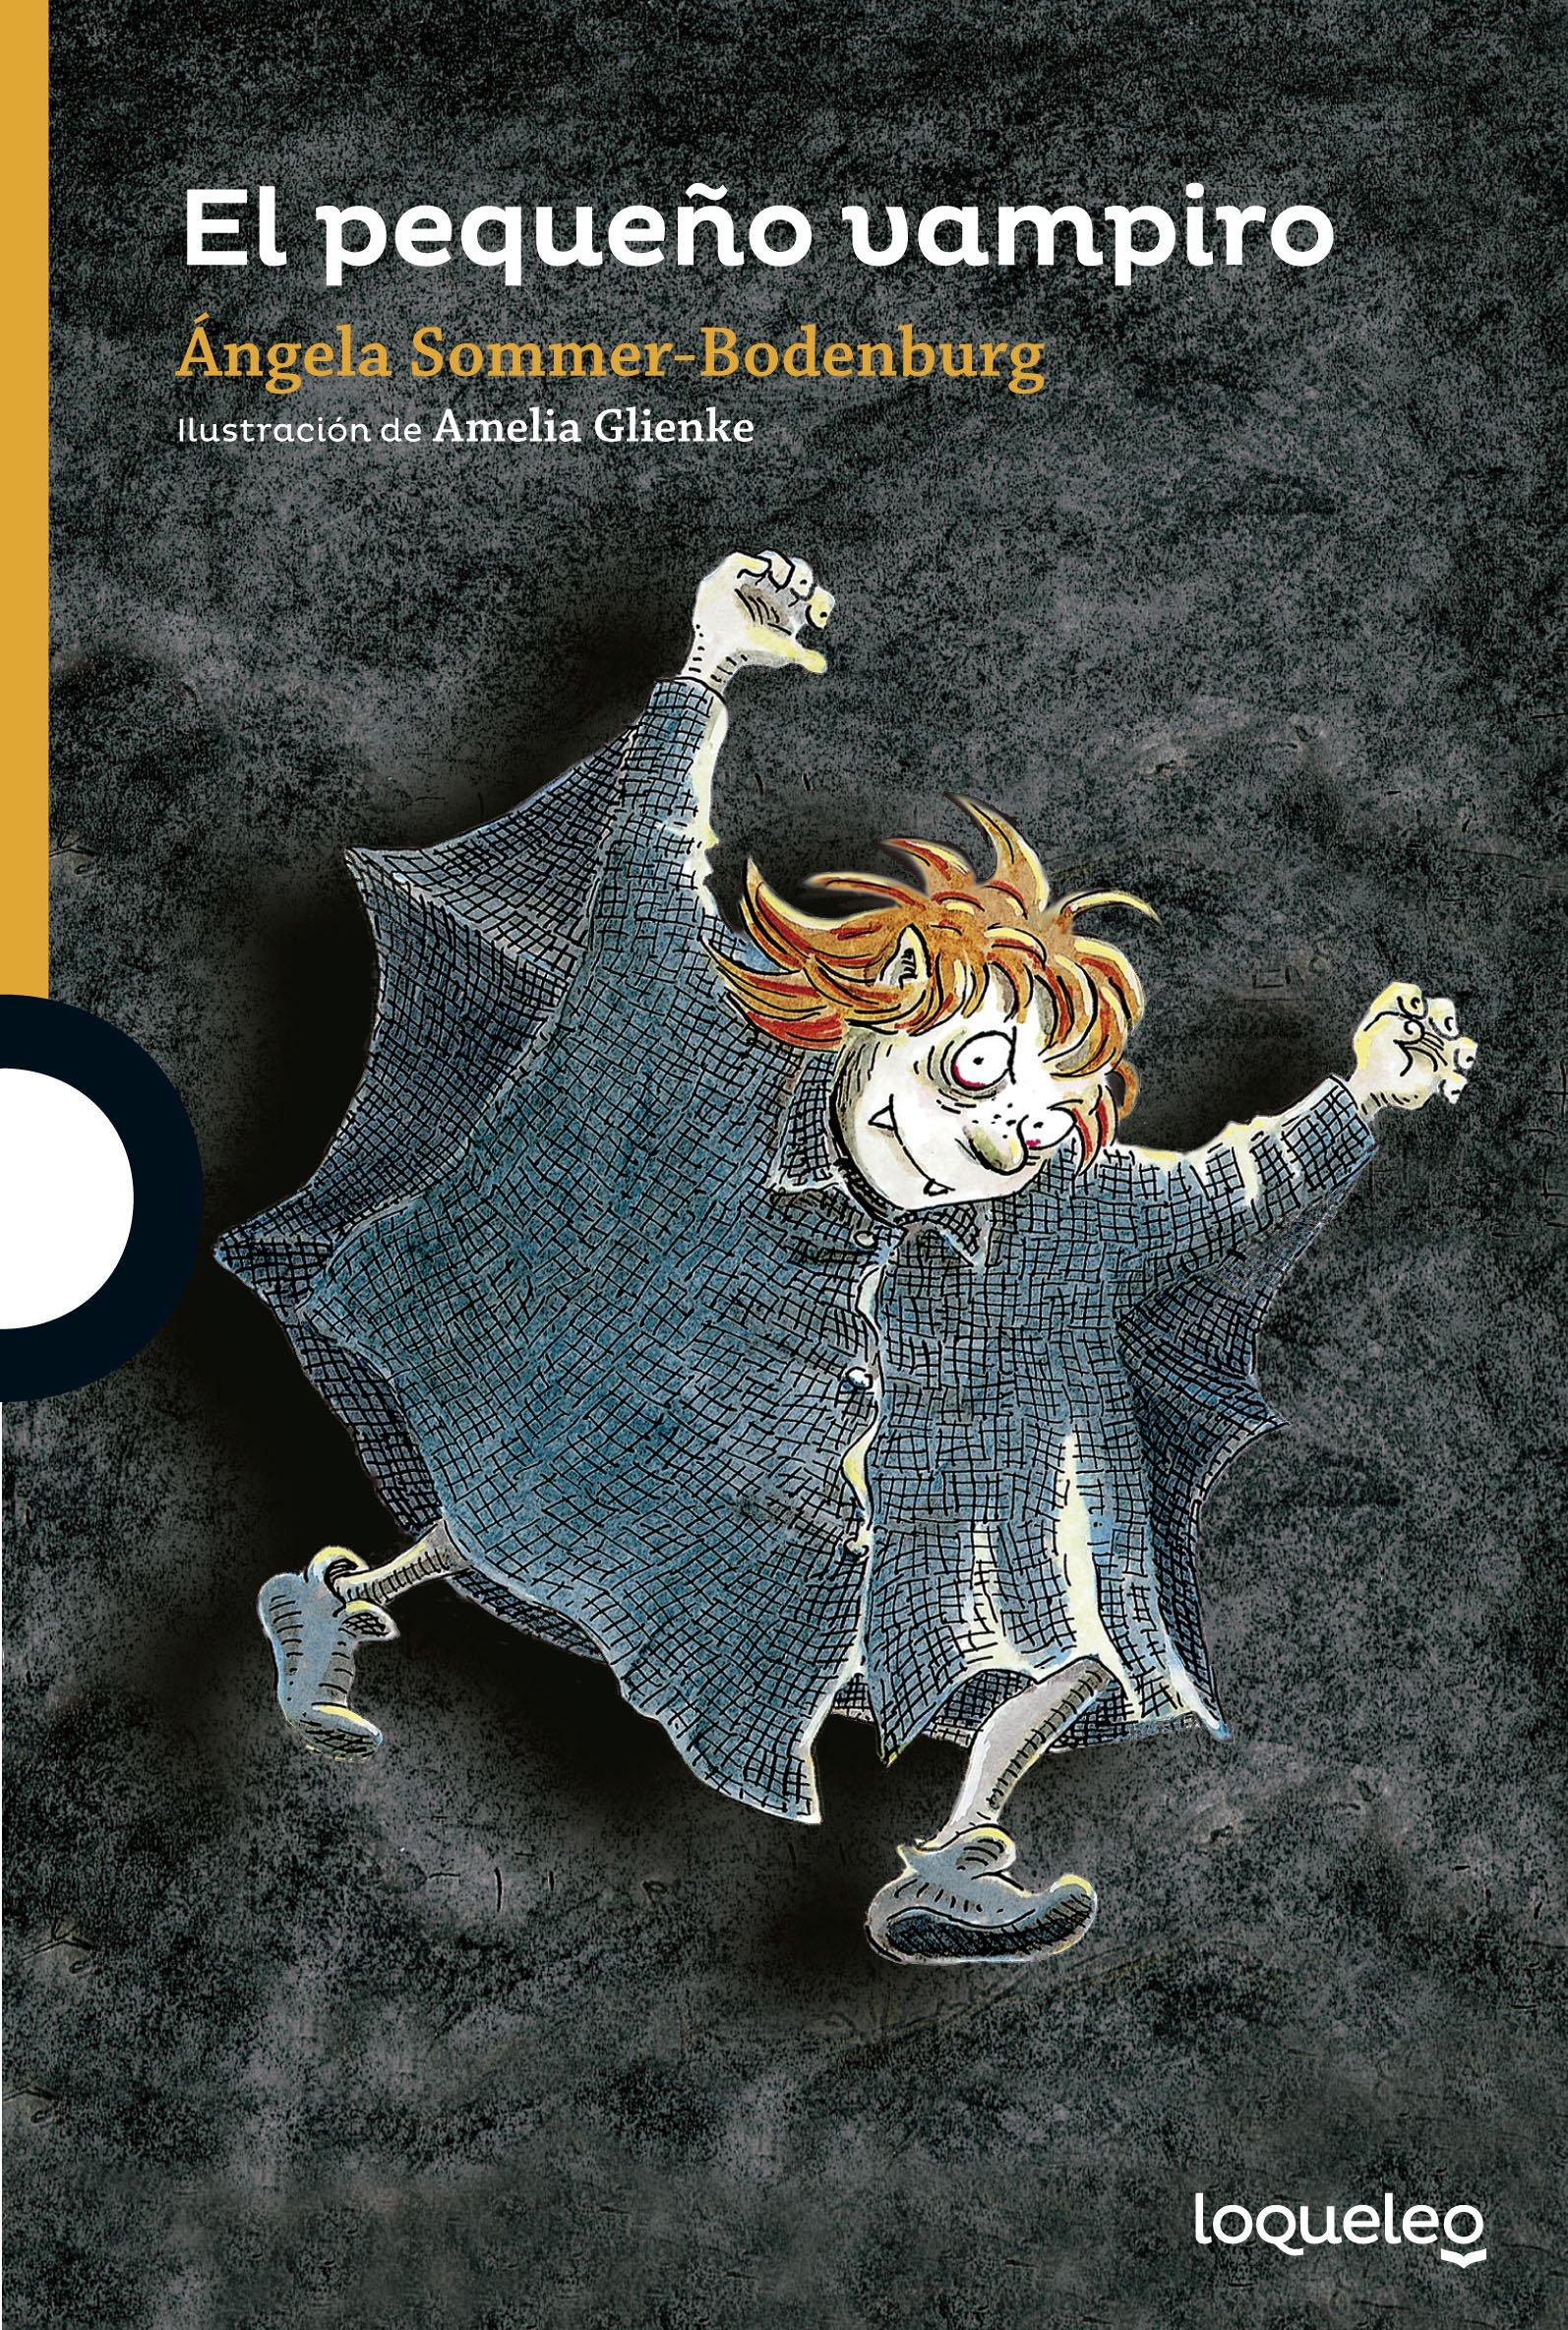 El pequeño vampiro Libro de texto – 14 ene 2016 Angela Sommer-Bodenburg Santillana Educación S.L. 8491221220